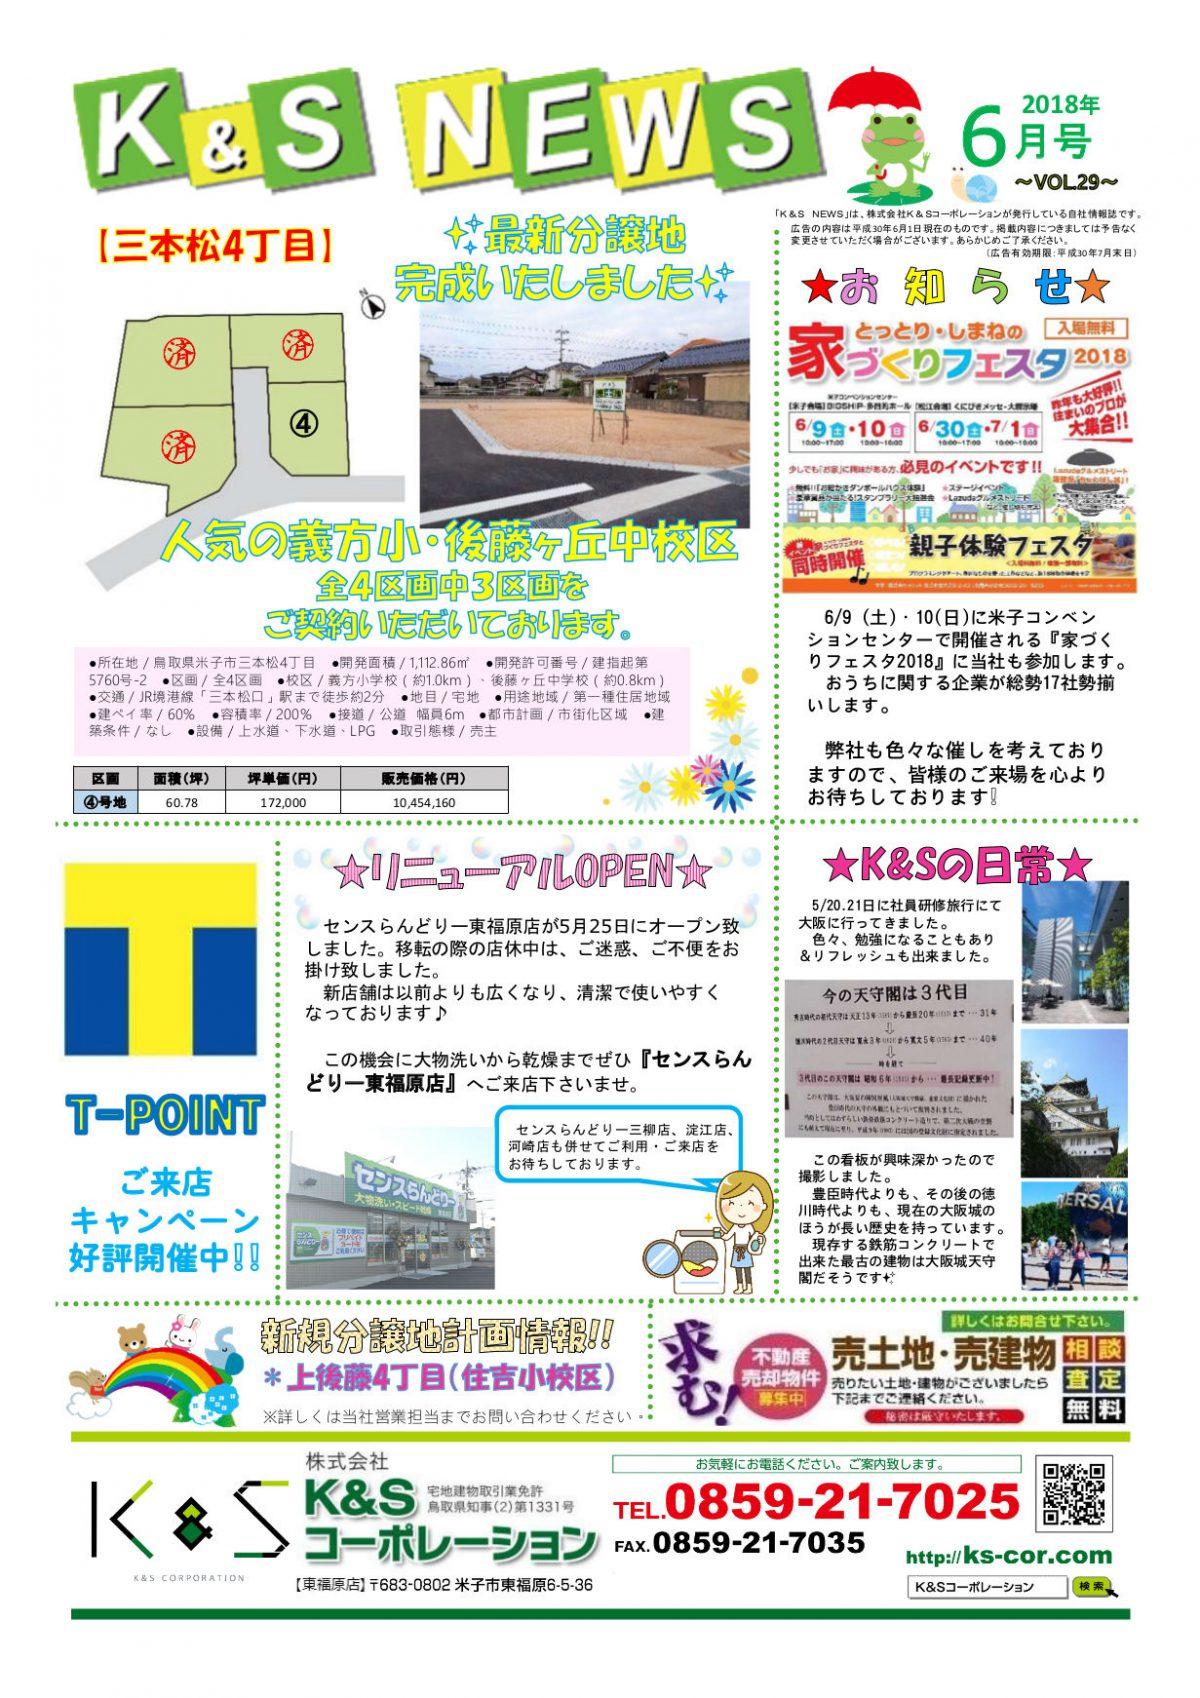 K&S NEWS 2018年6月号発行!